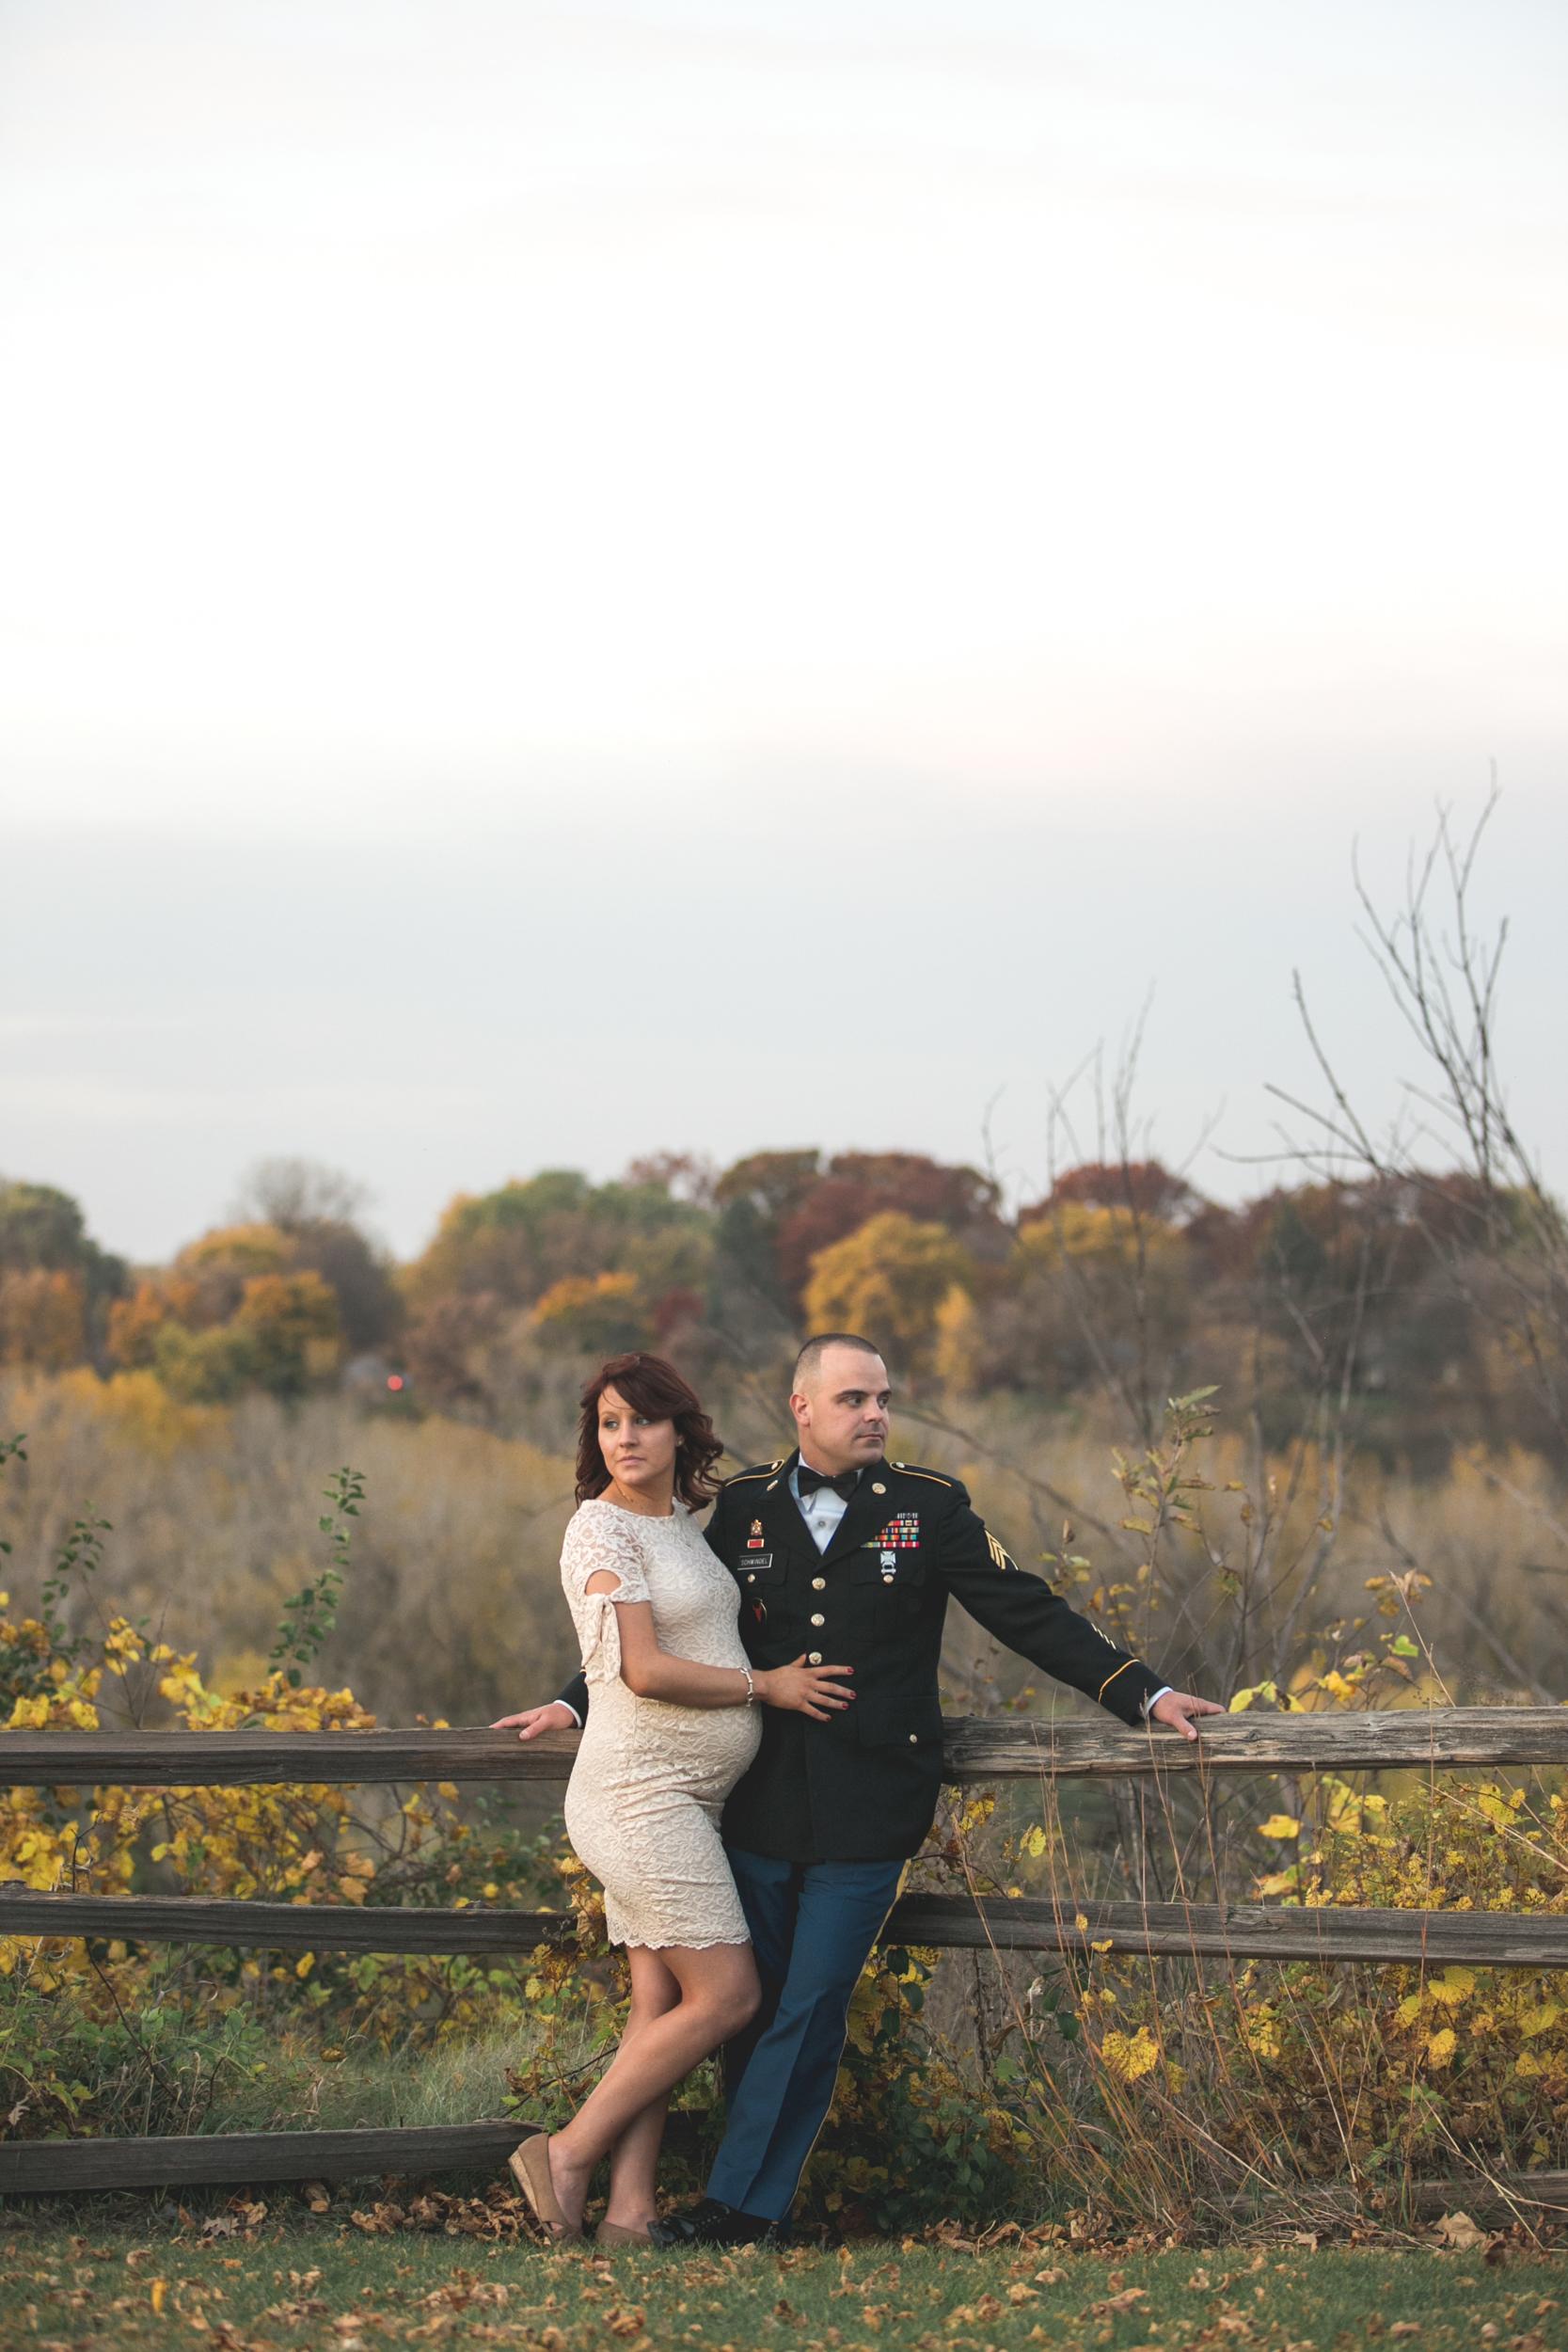 Fort Snelling Elopement St. Paul, MN, Fort Snelling Elopement, Military Elopement, Intimate Military Wedding, intimate elopement wedding-www.rachelsmak.com41.jpg